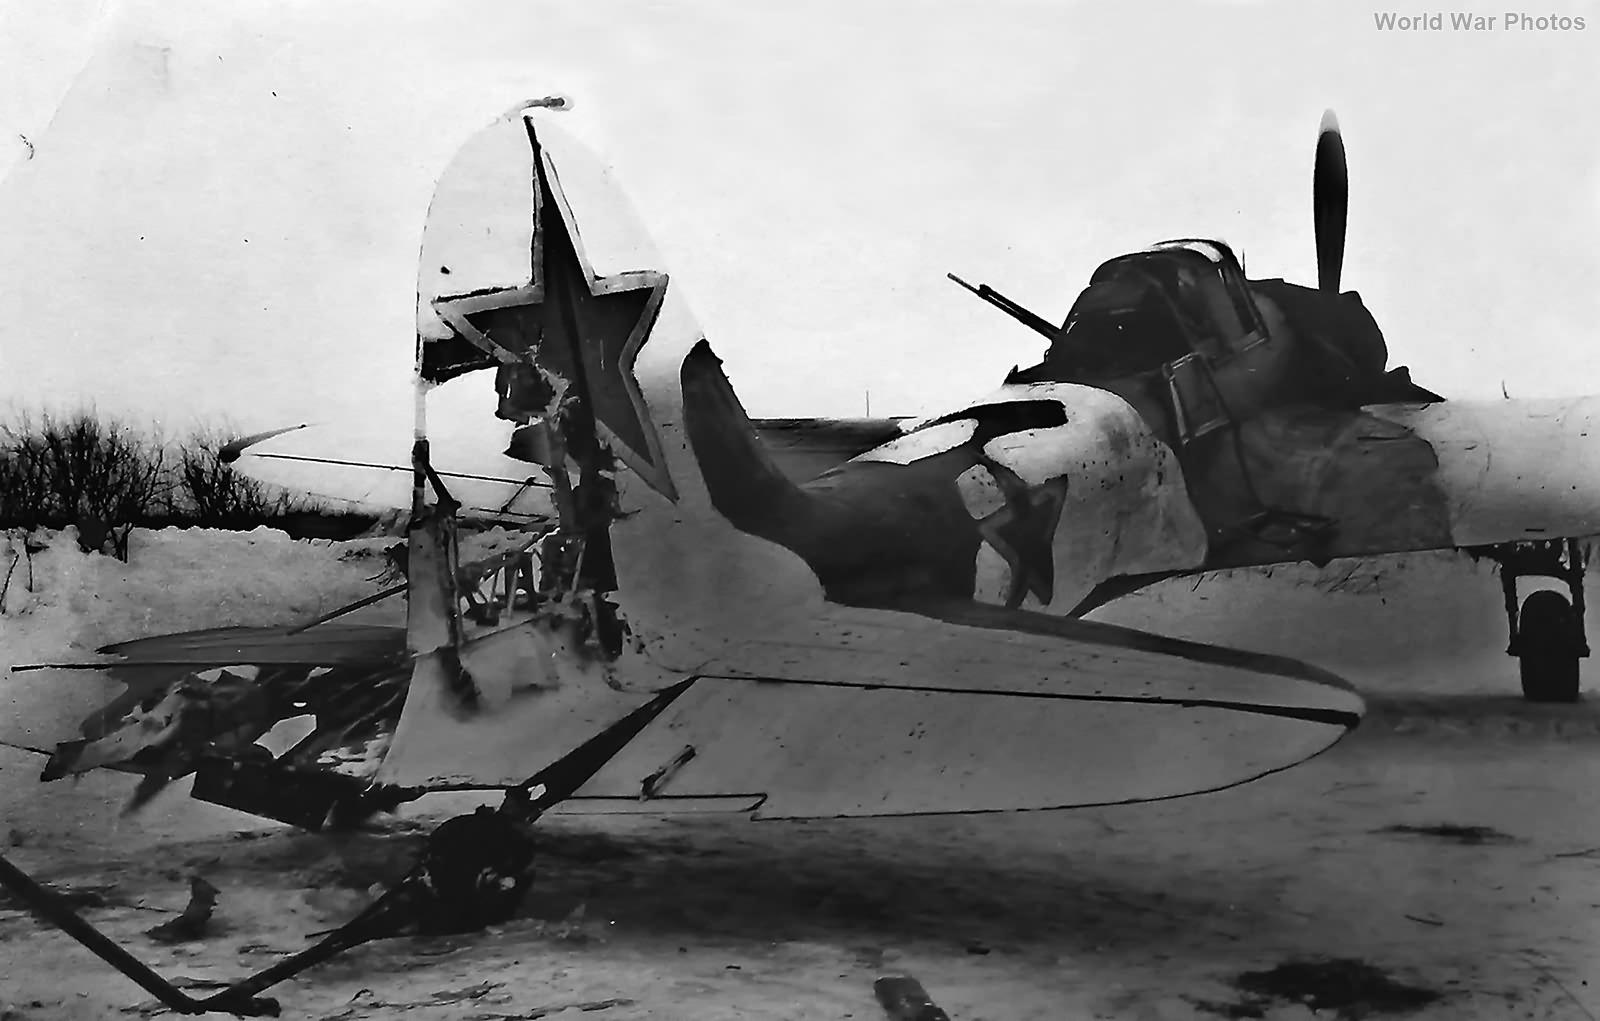 Damaged tail Il-2